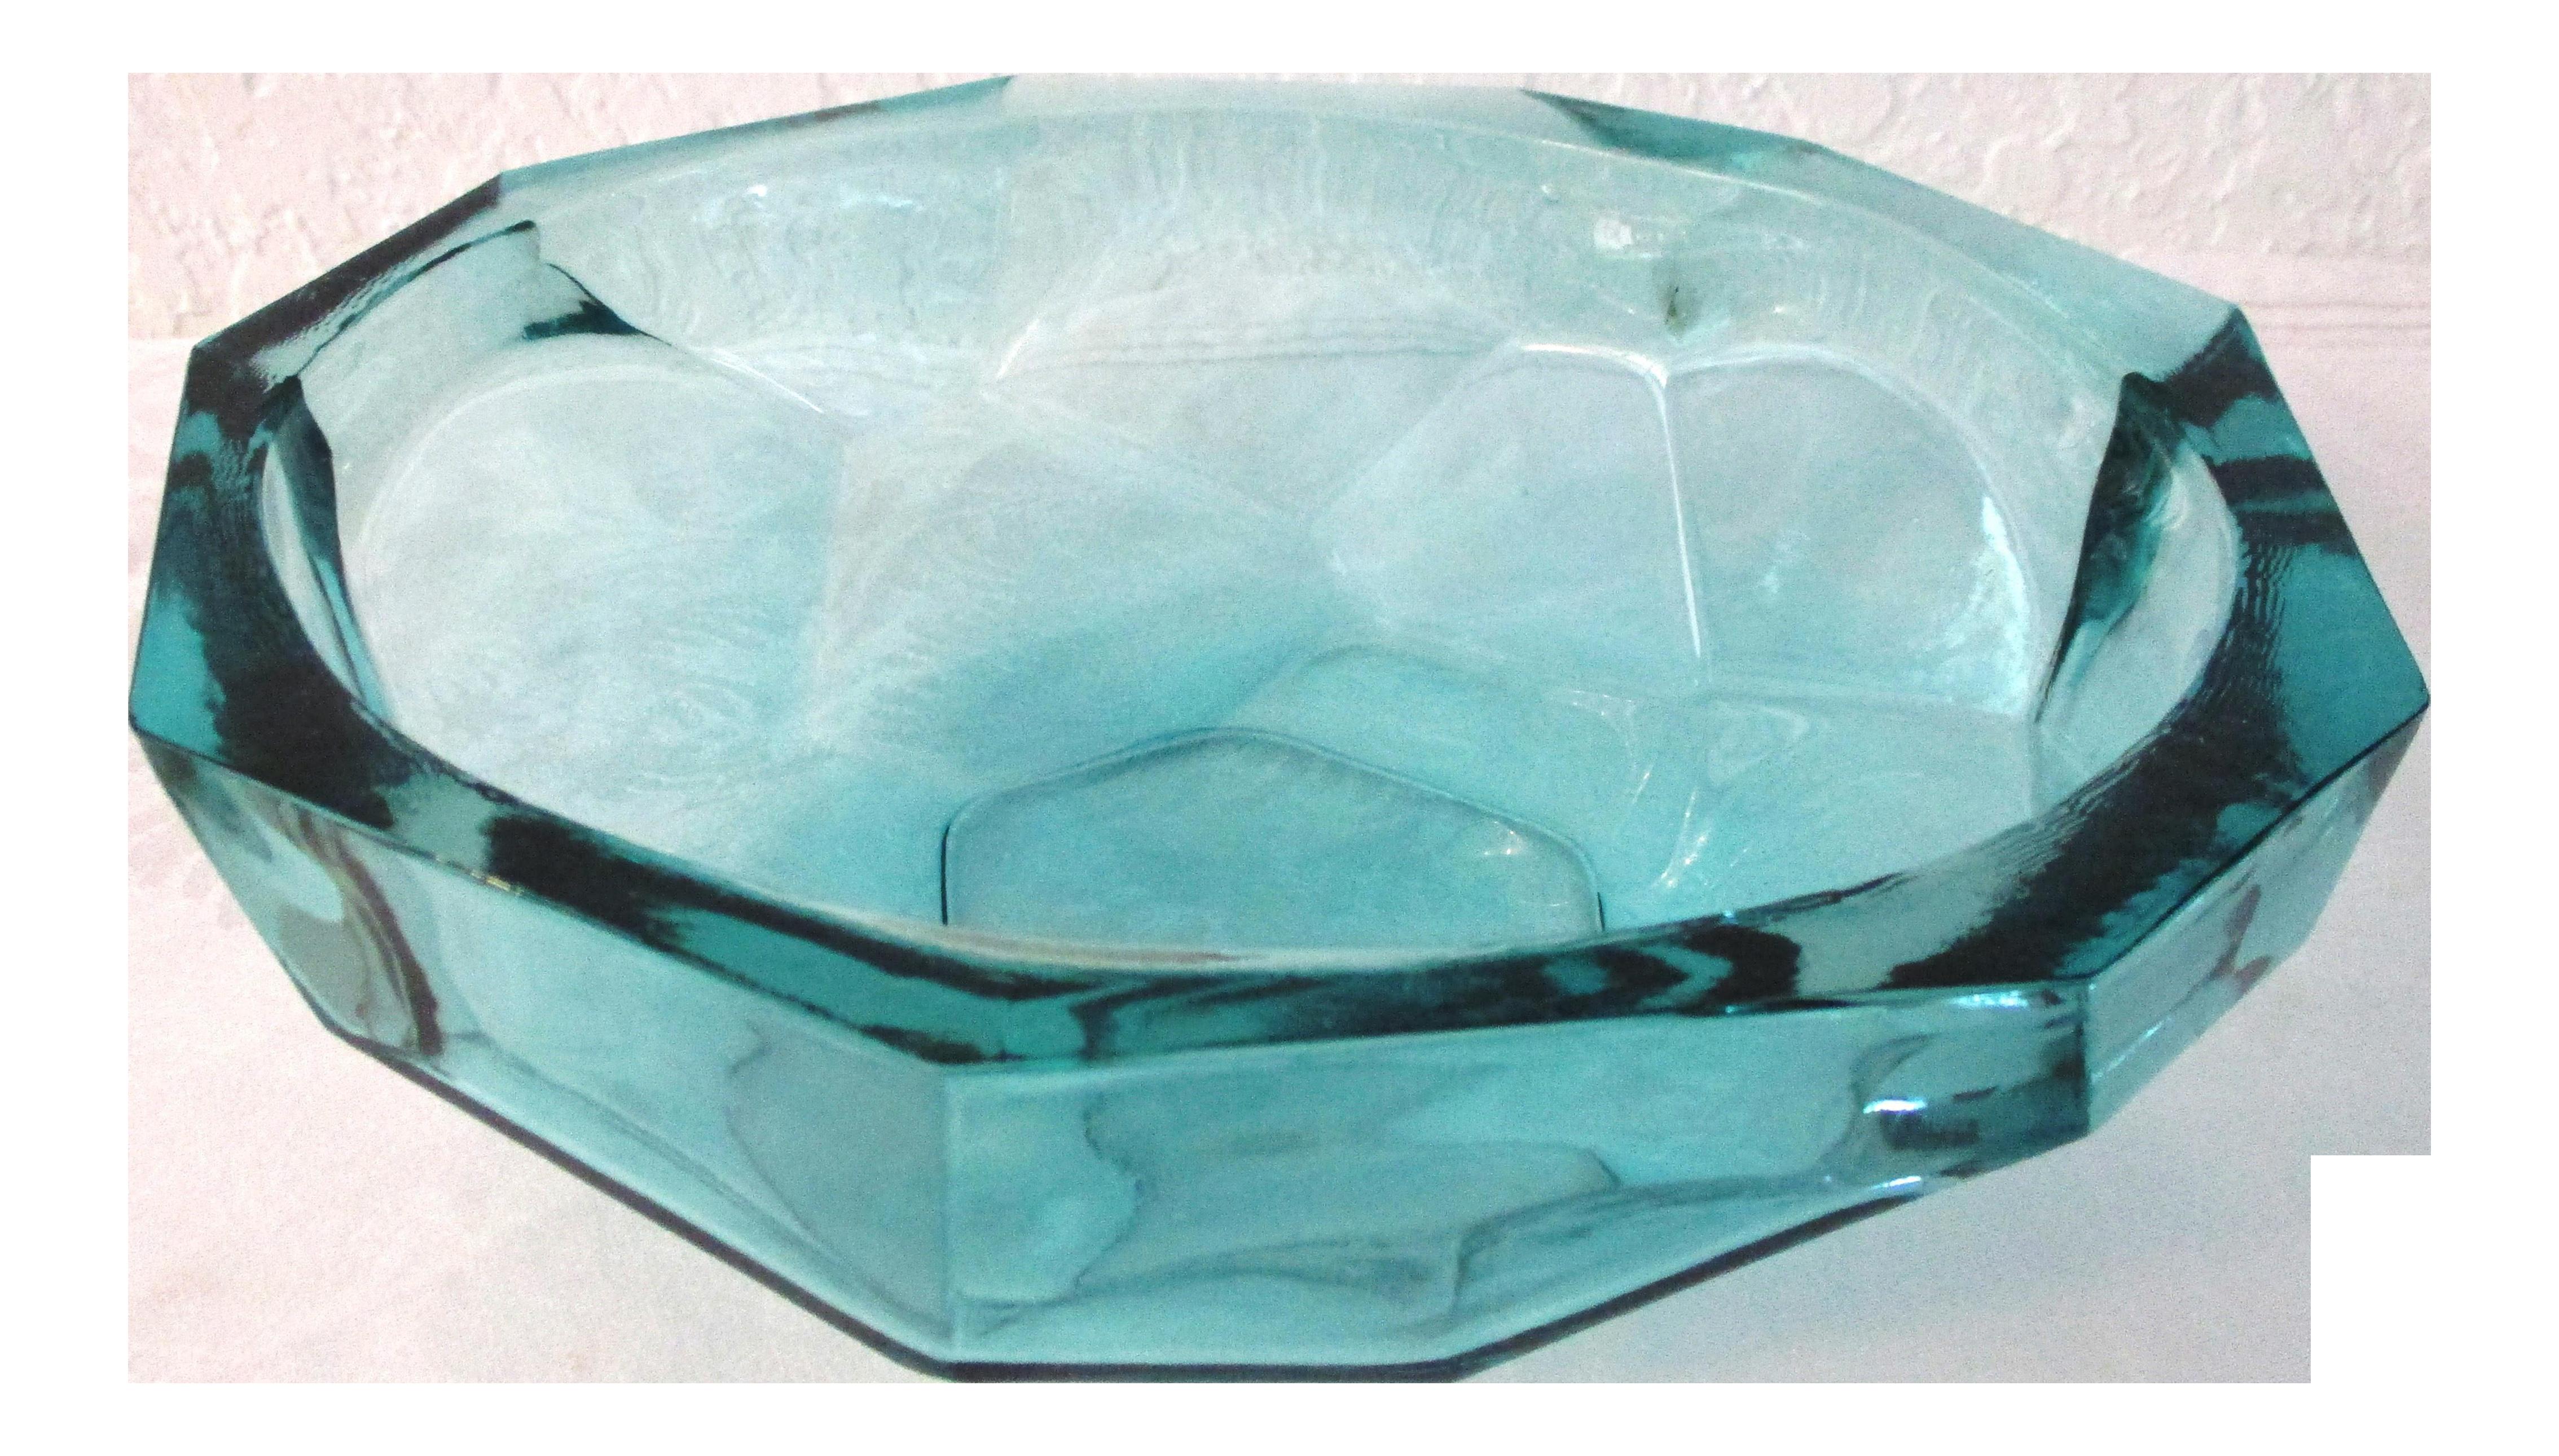 kunstglas burger style aqua faceted glass bowl   chairish